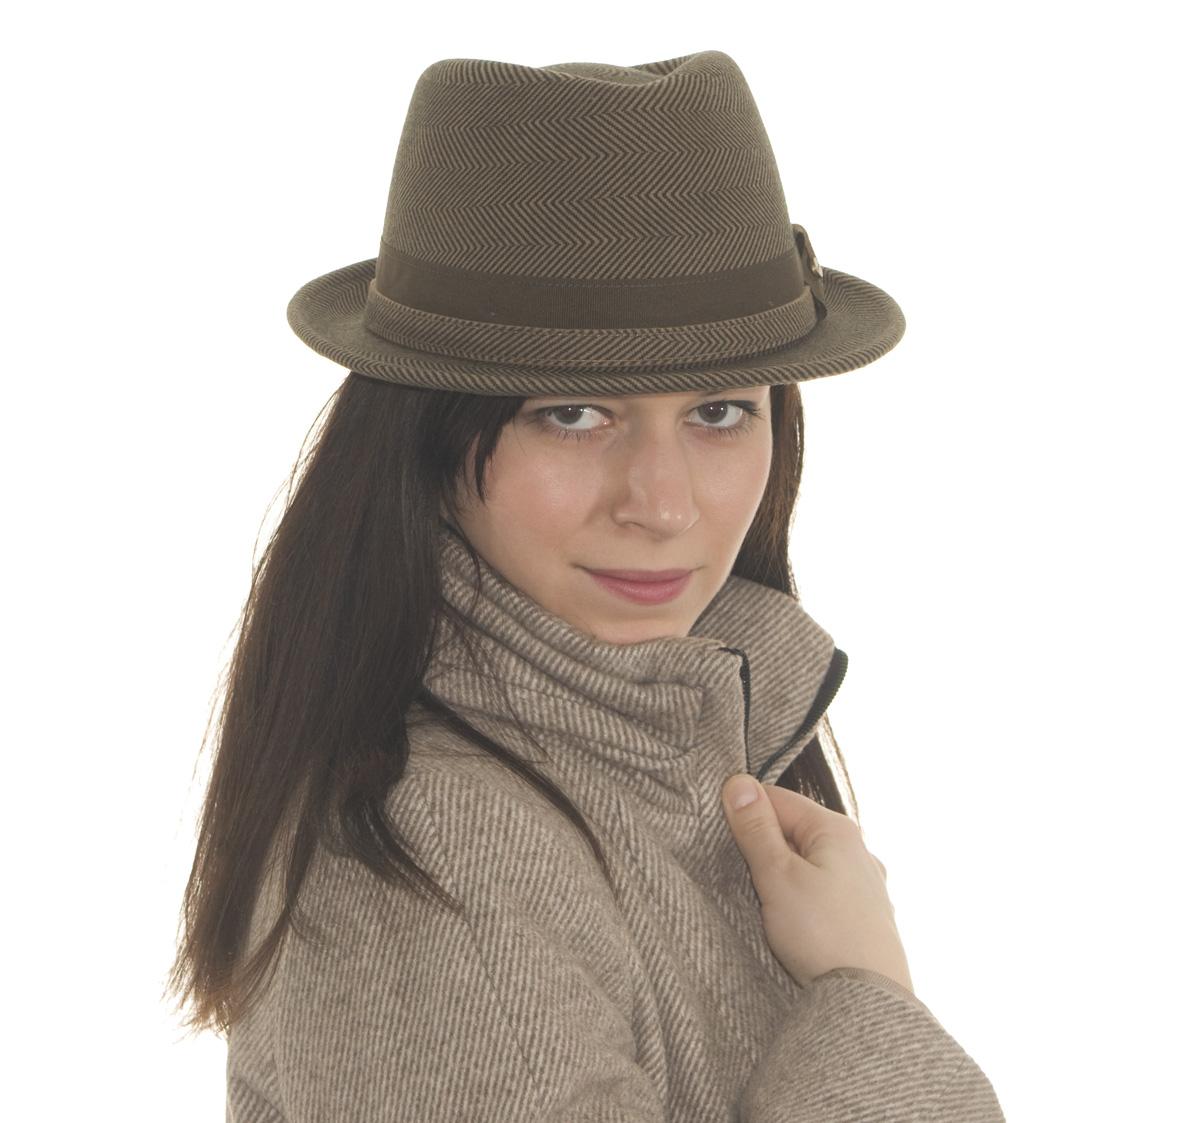 6bcd12be4b0 Historie klobouků